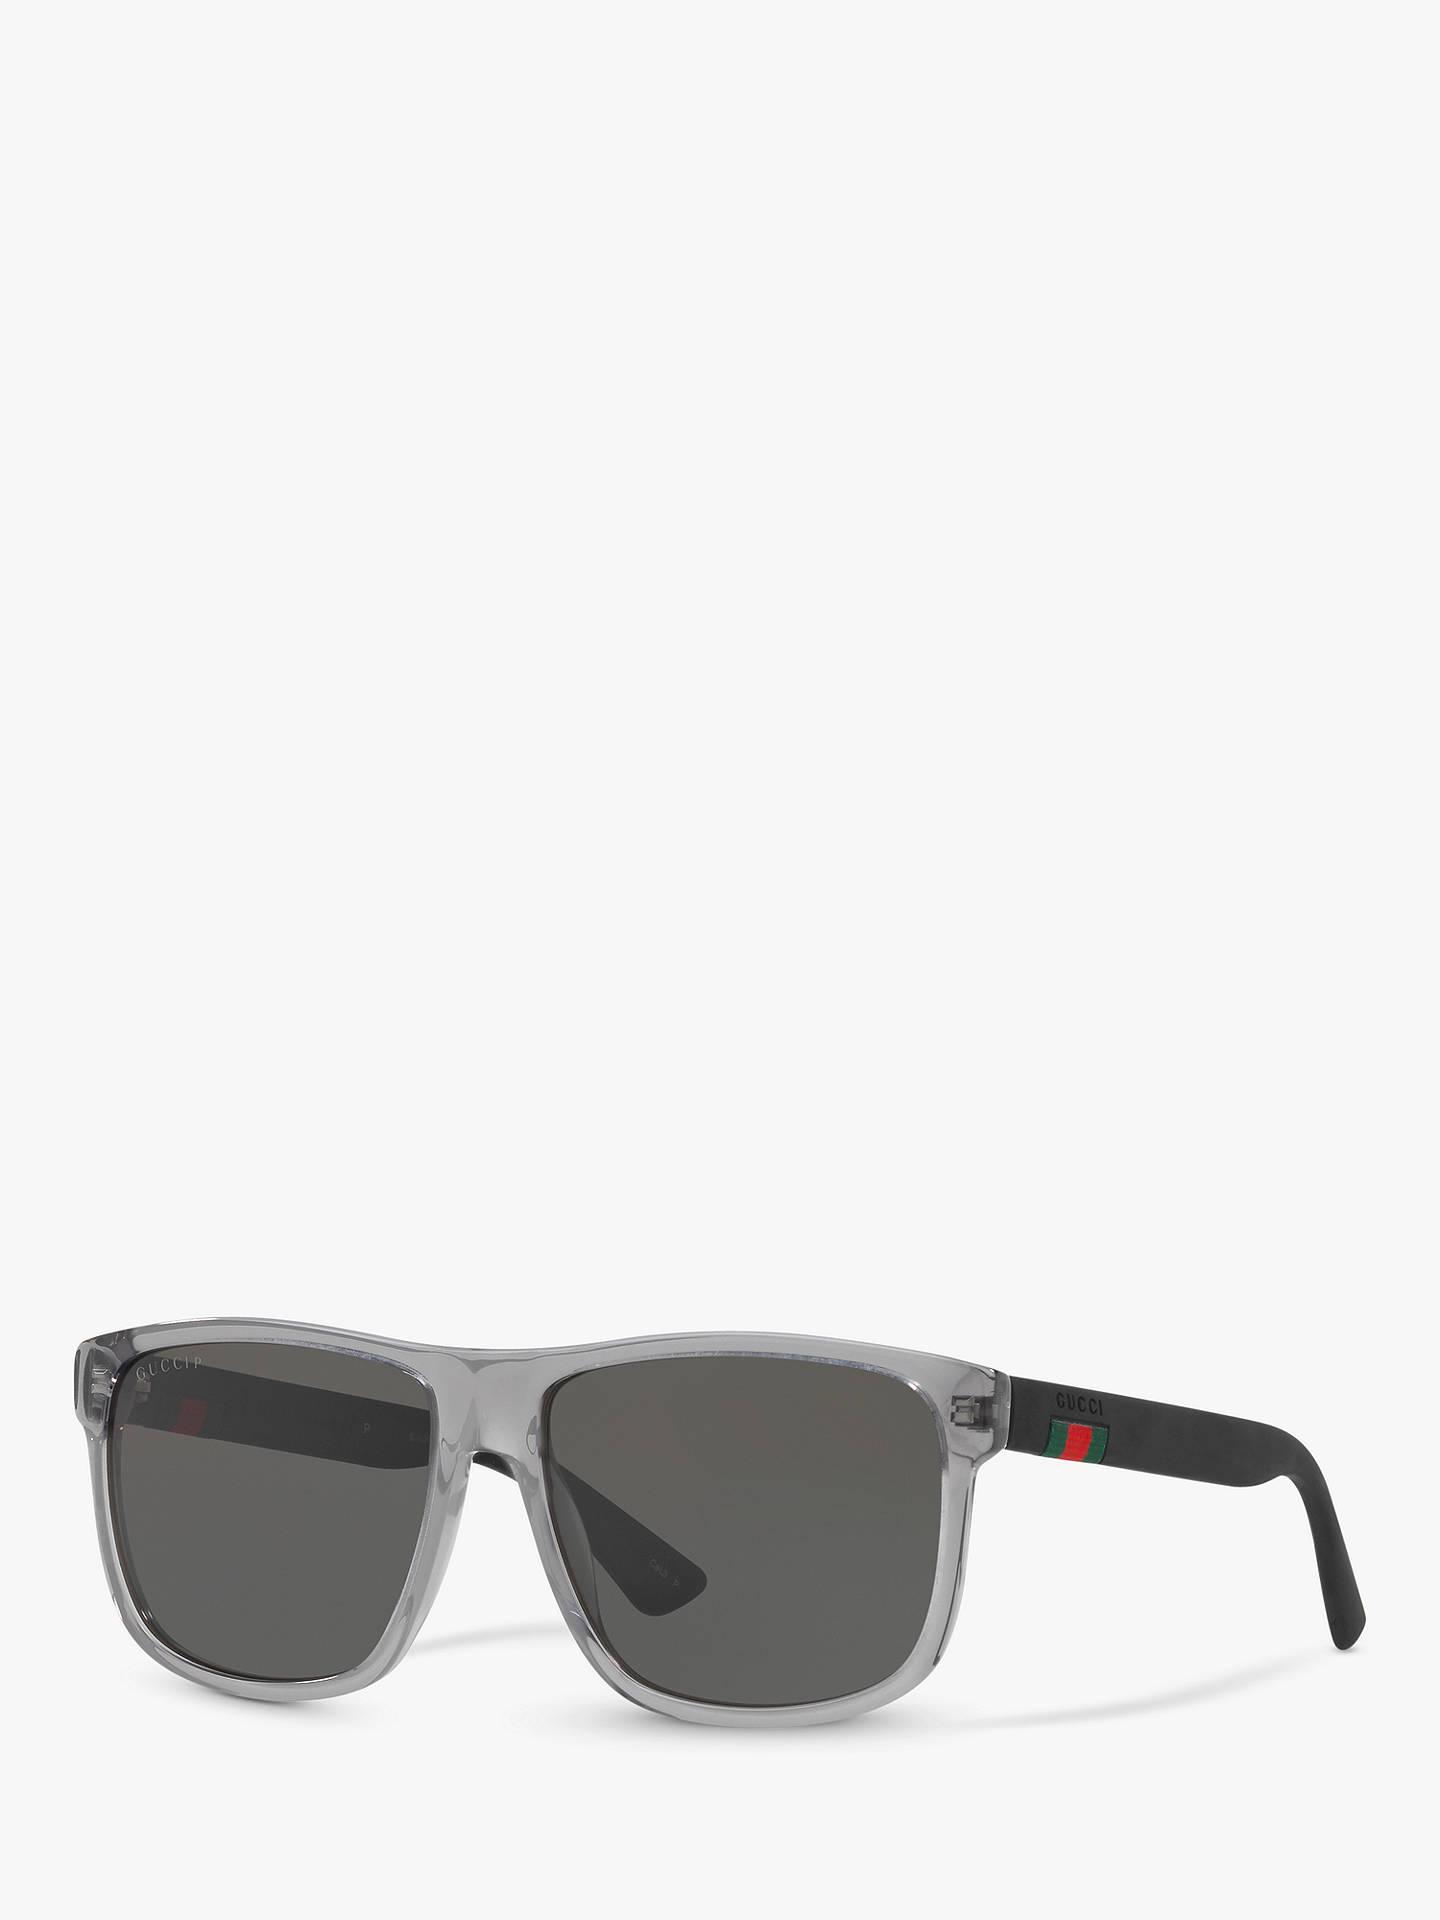 6db68e646f0 Gucci GG0010S Polarised D-Frame Sunglasses at John Lewis   Partners